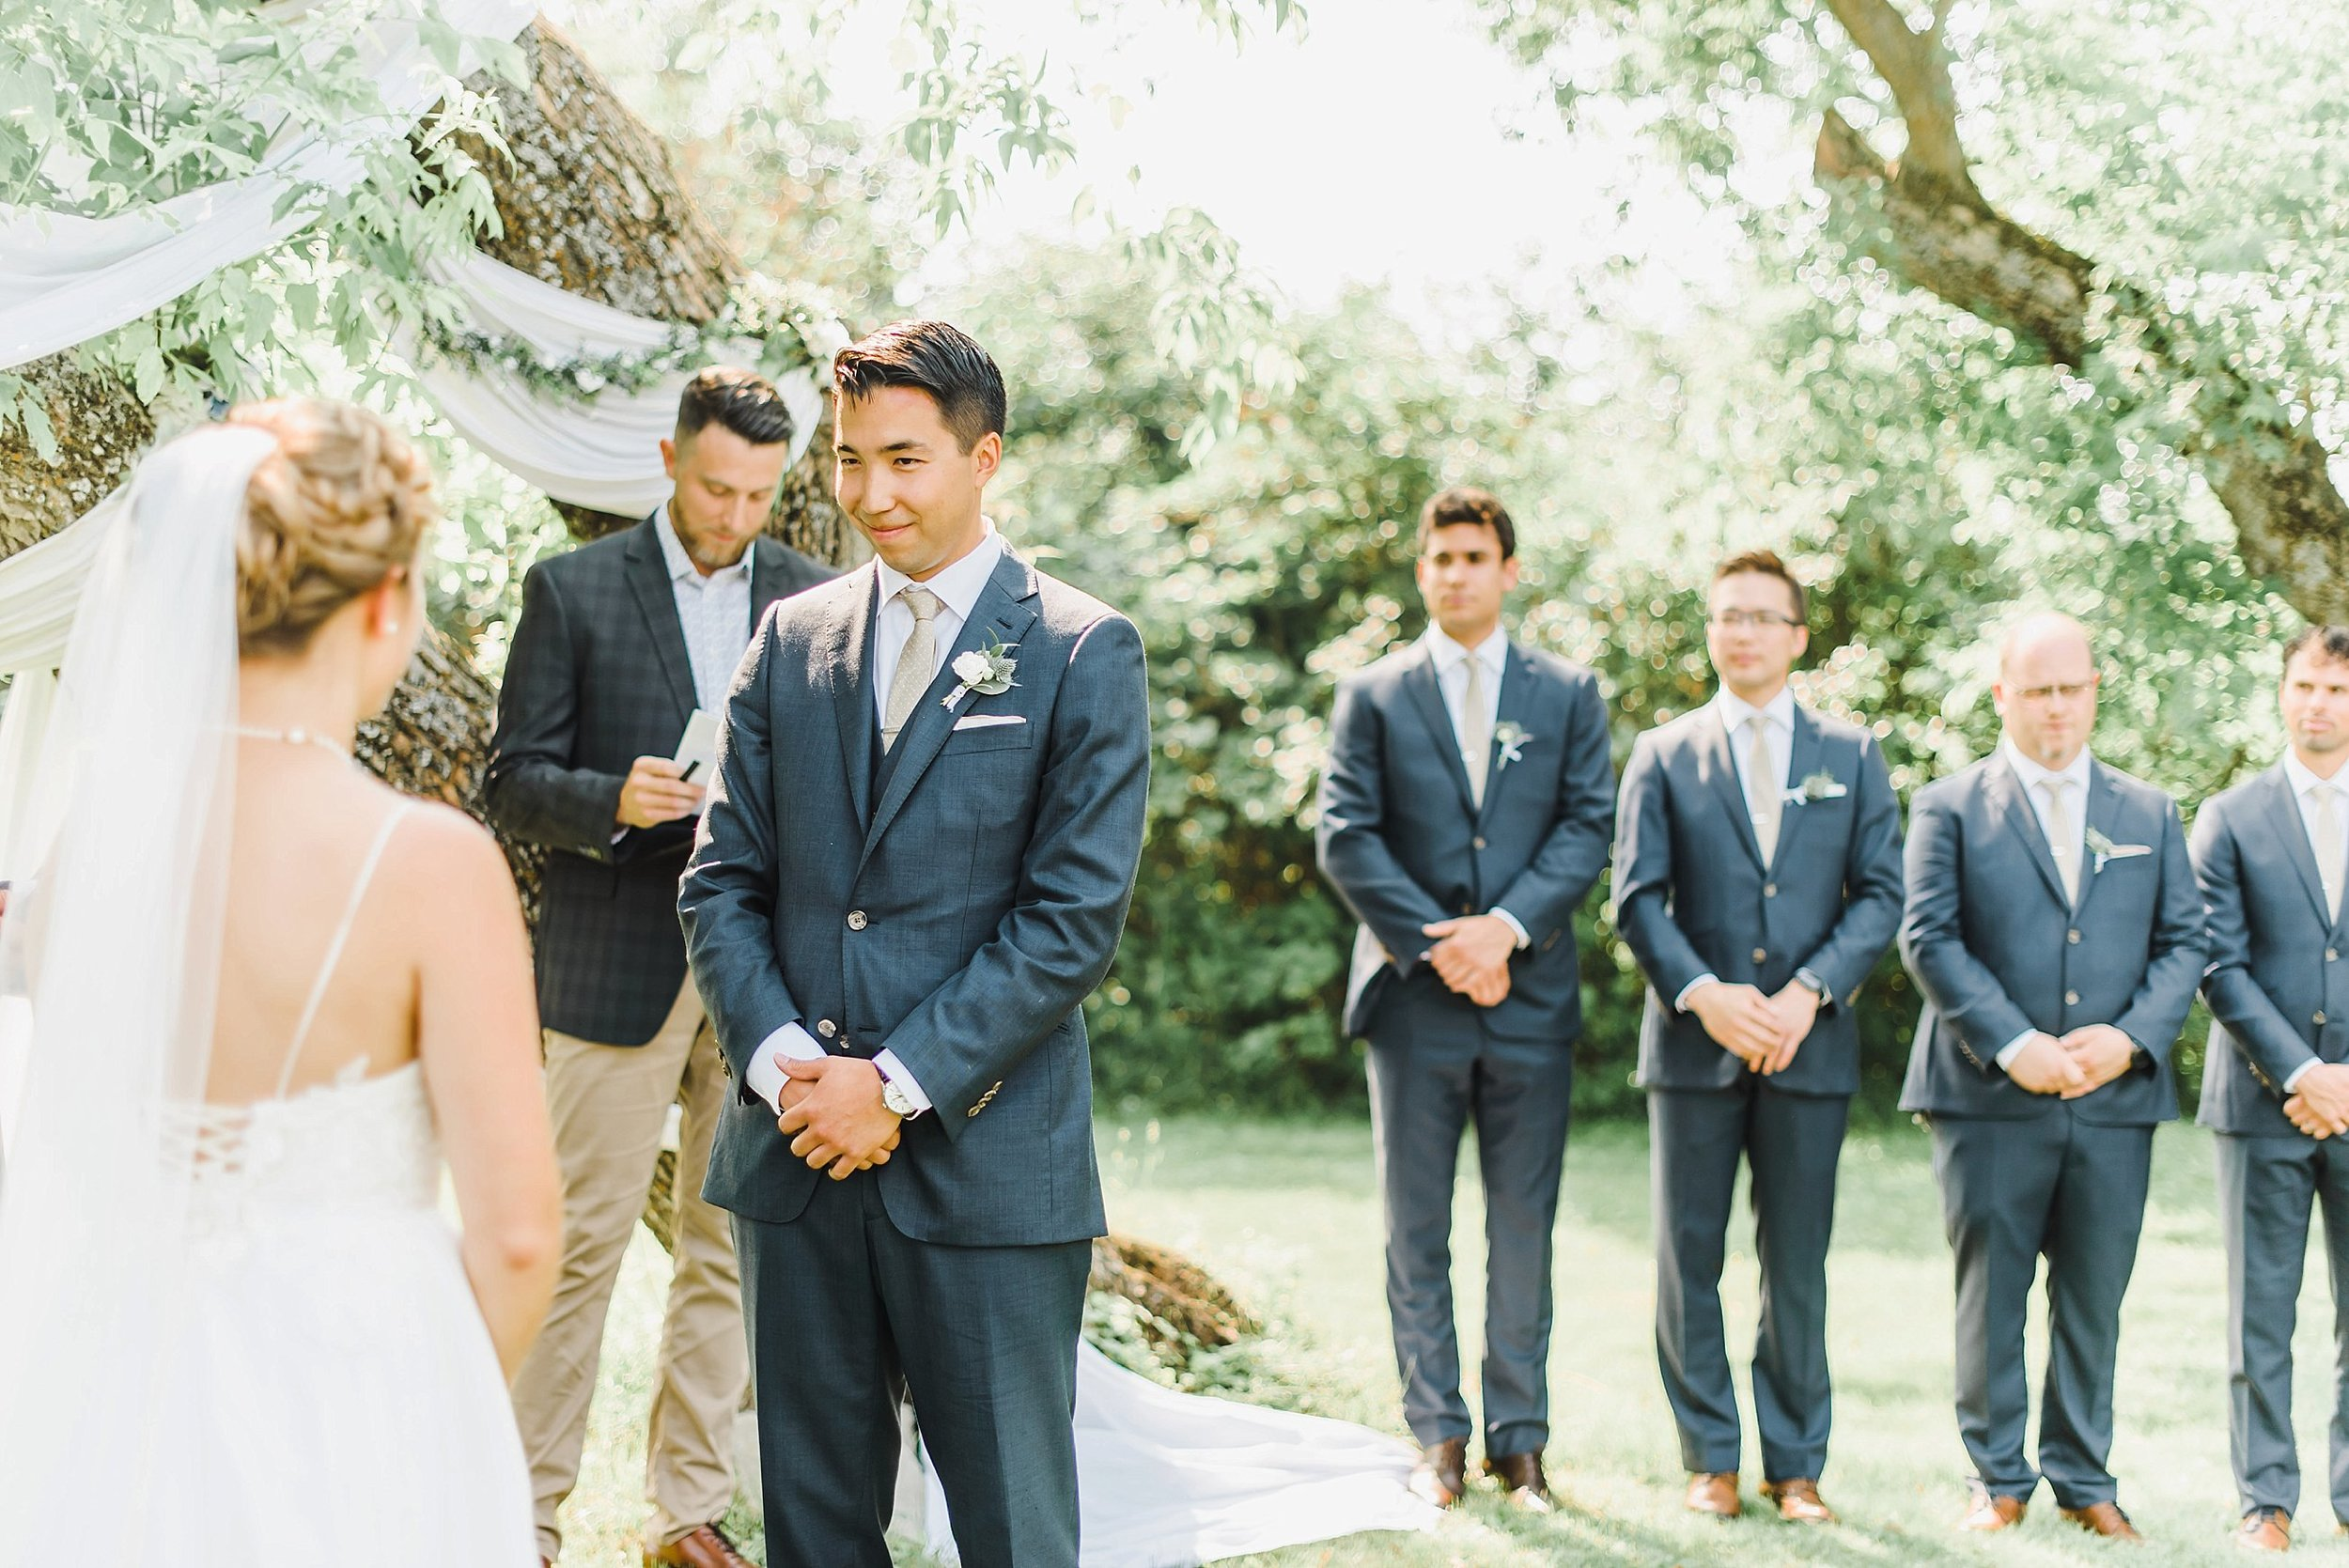 light airy indie fine art ottawa wedding photographer | Ali and Batoul Photography_0813.jpg